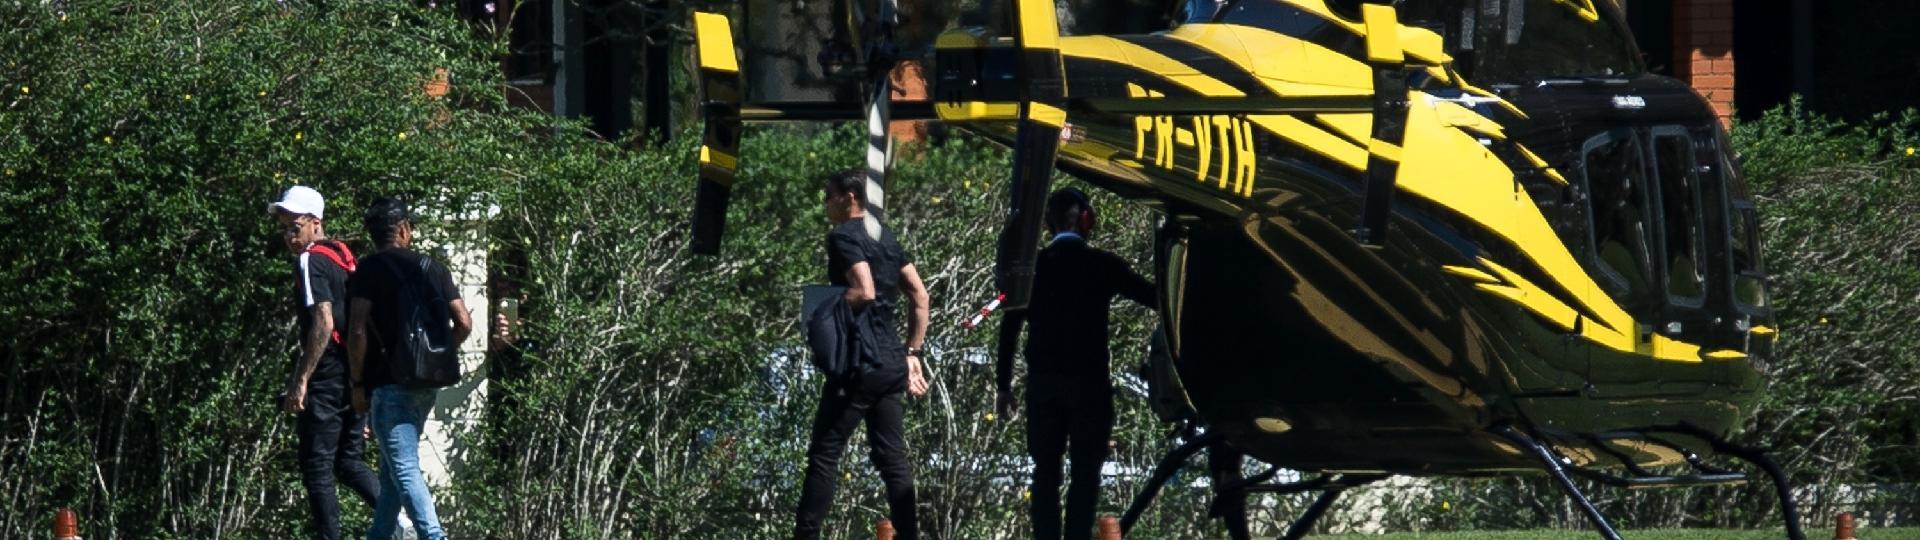 Neymar, Douglas Costa e Thiago Silva chegam de helicóptero à Granja Comary